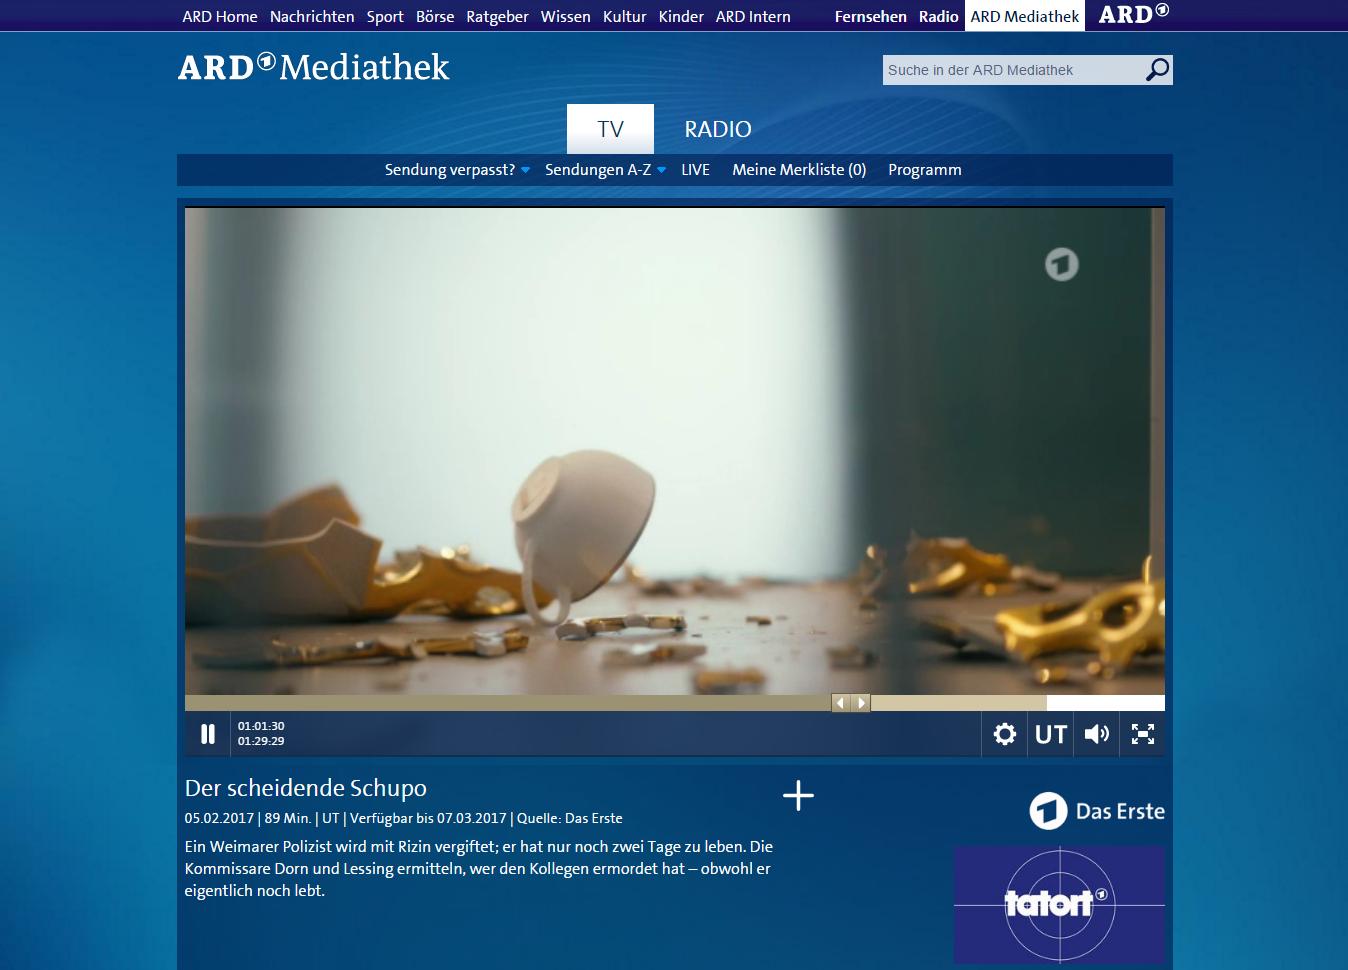 Tatort - Der scheidende Schupo EA 5.2.2017 Screenshot ARD Mediathek